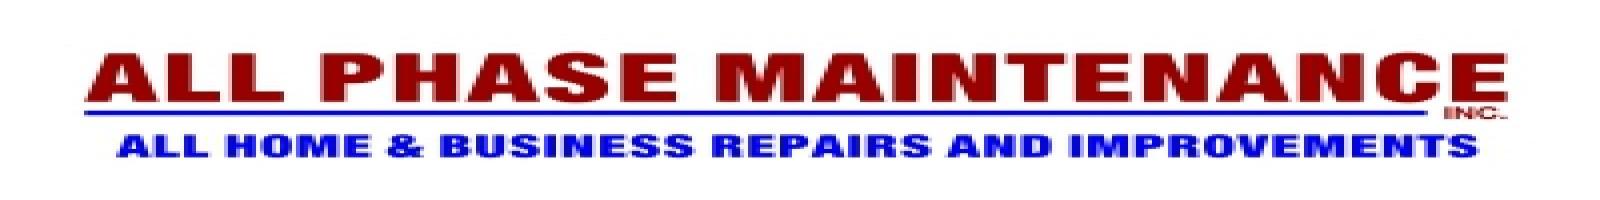 All Phase Maintenance, Inc